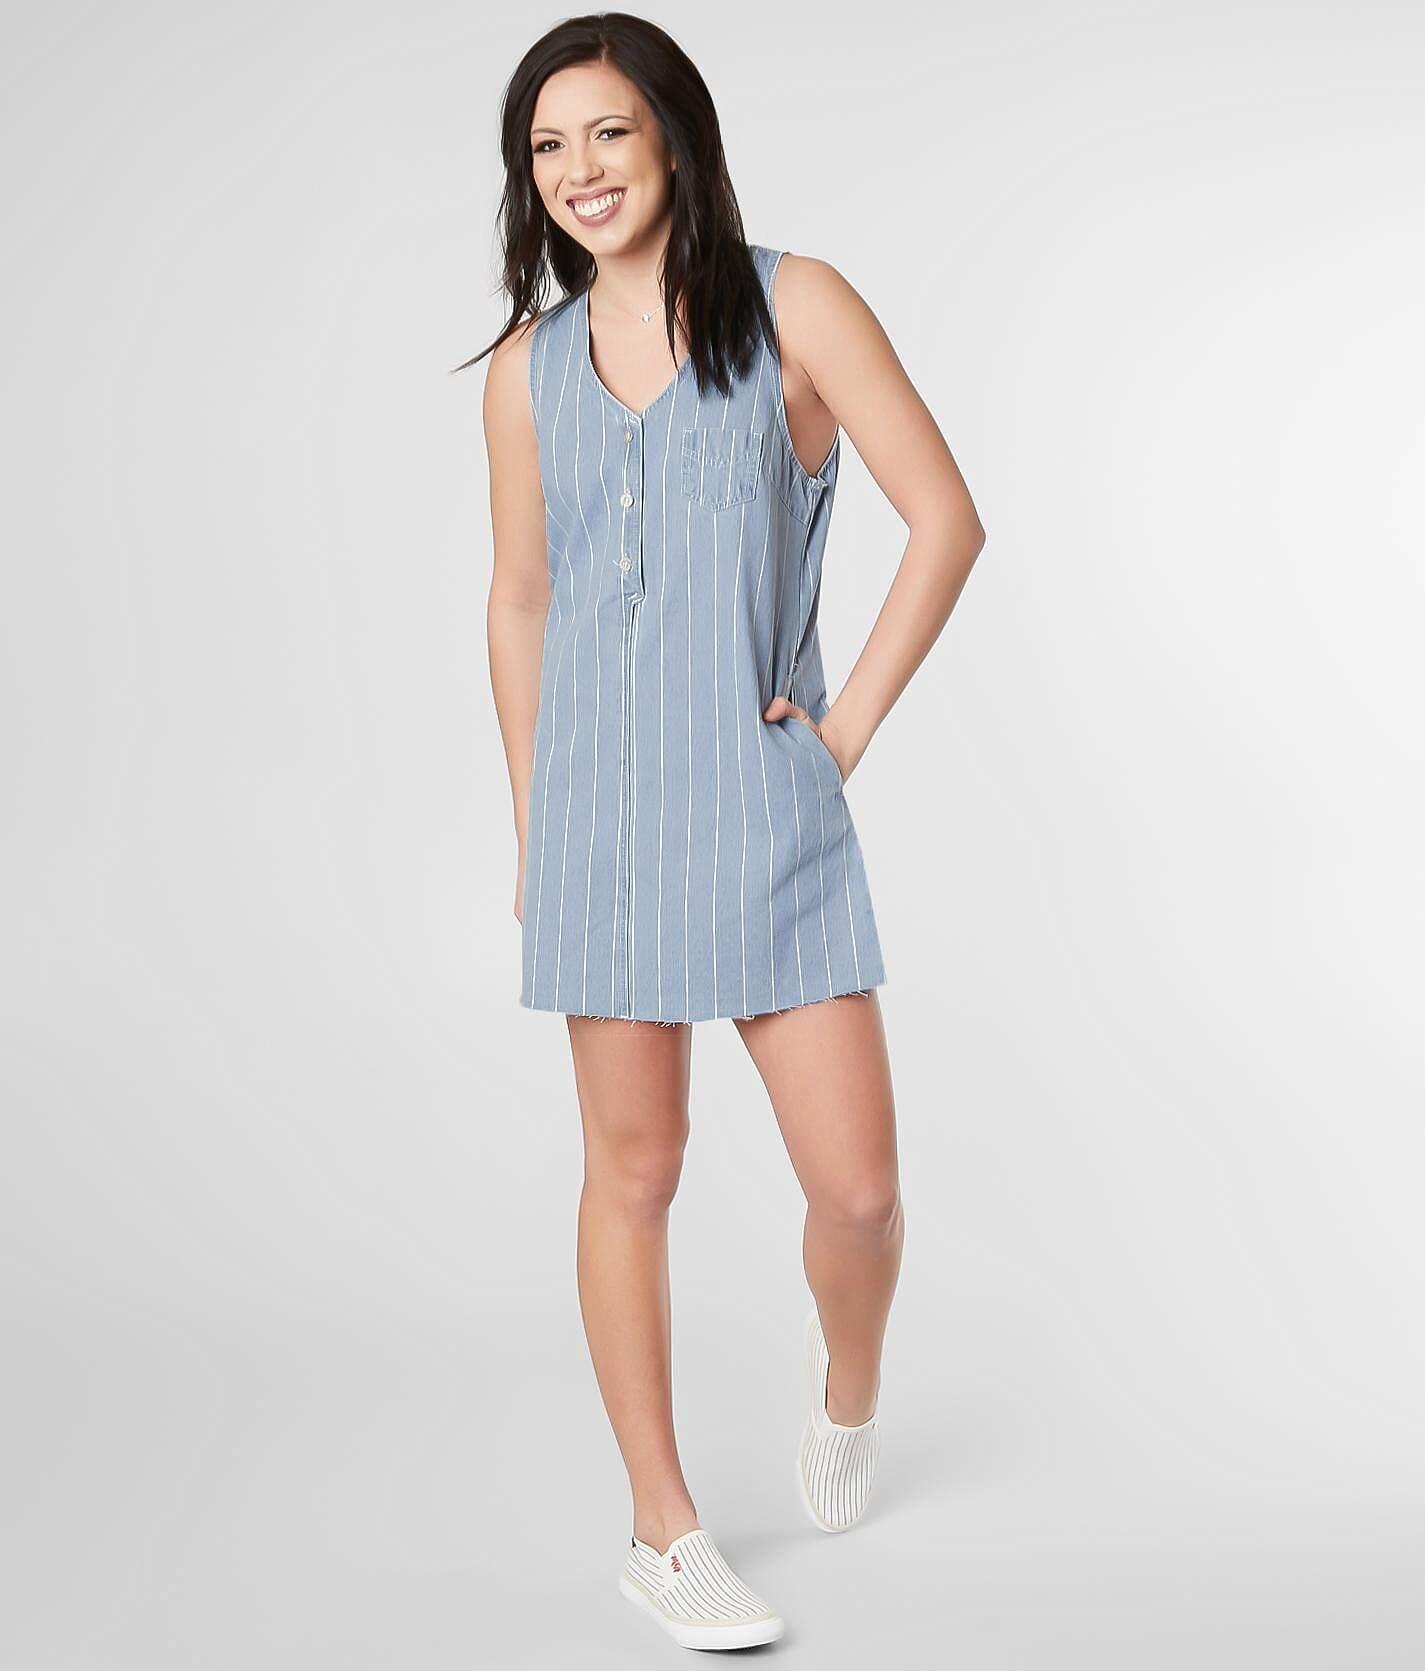 Denim Sleeveless Dress